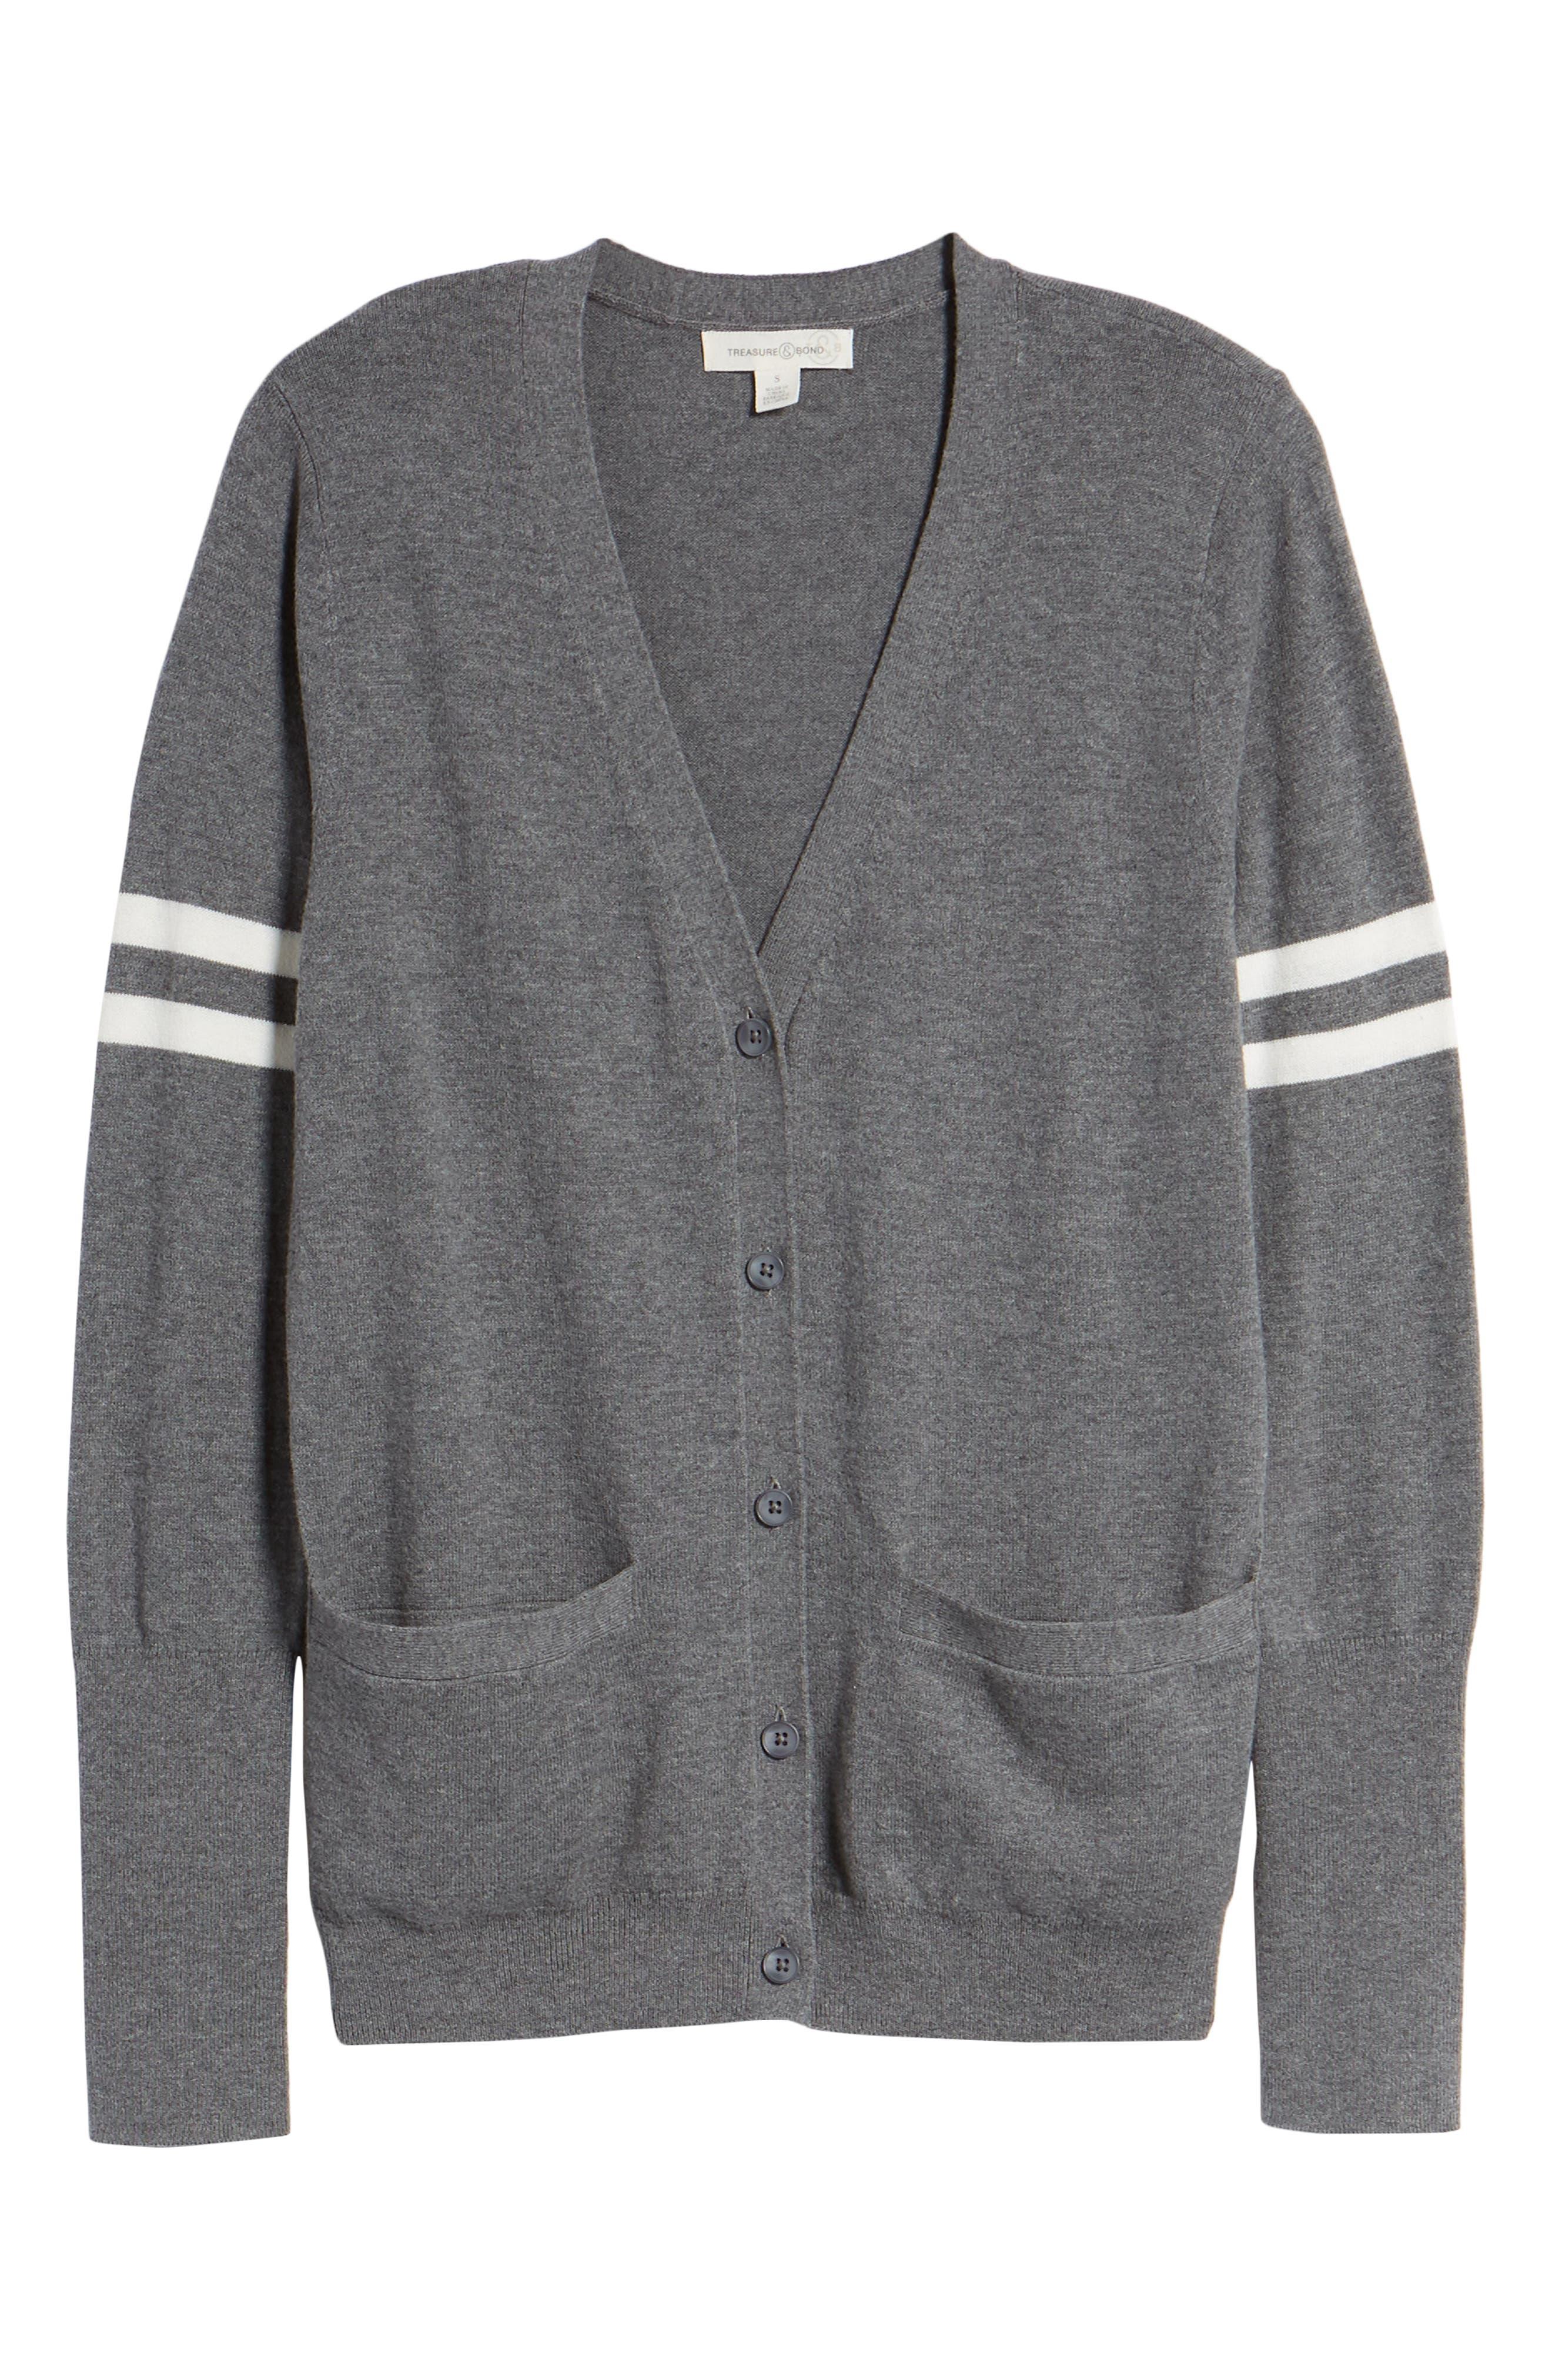 Stripe Sleeve Cardigan,                             Alternate thumbnail 7, color,                             Grey Dark Heather Ivory Combo